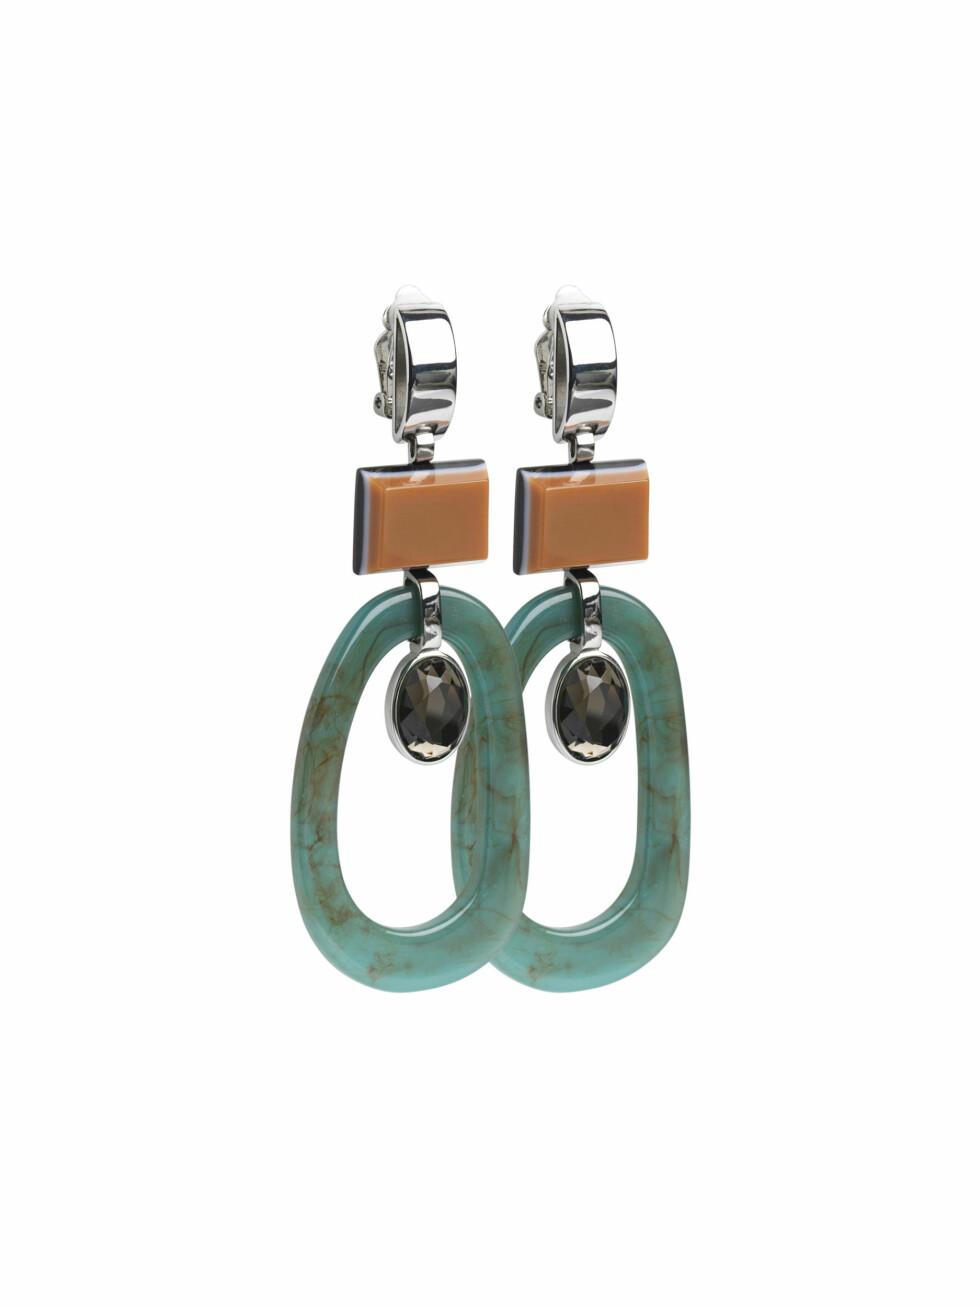 Øredobber fra By Malene Birger | kr 1700 | http://www.bymalenebirger.com/no/jewellery/valdis-earrings-Q62201001.html?cgid=Wc1364786&dwvar_Q62201001_color=003&dwvar_Q62201001_size=ONE